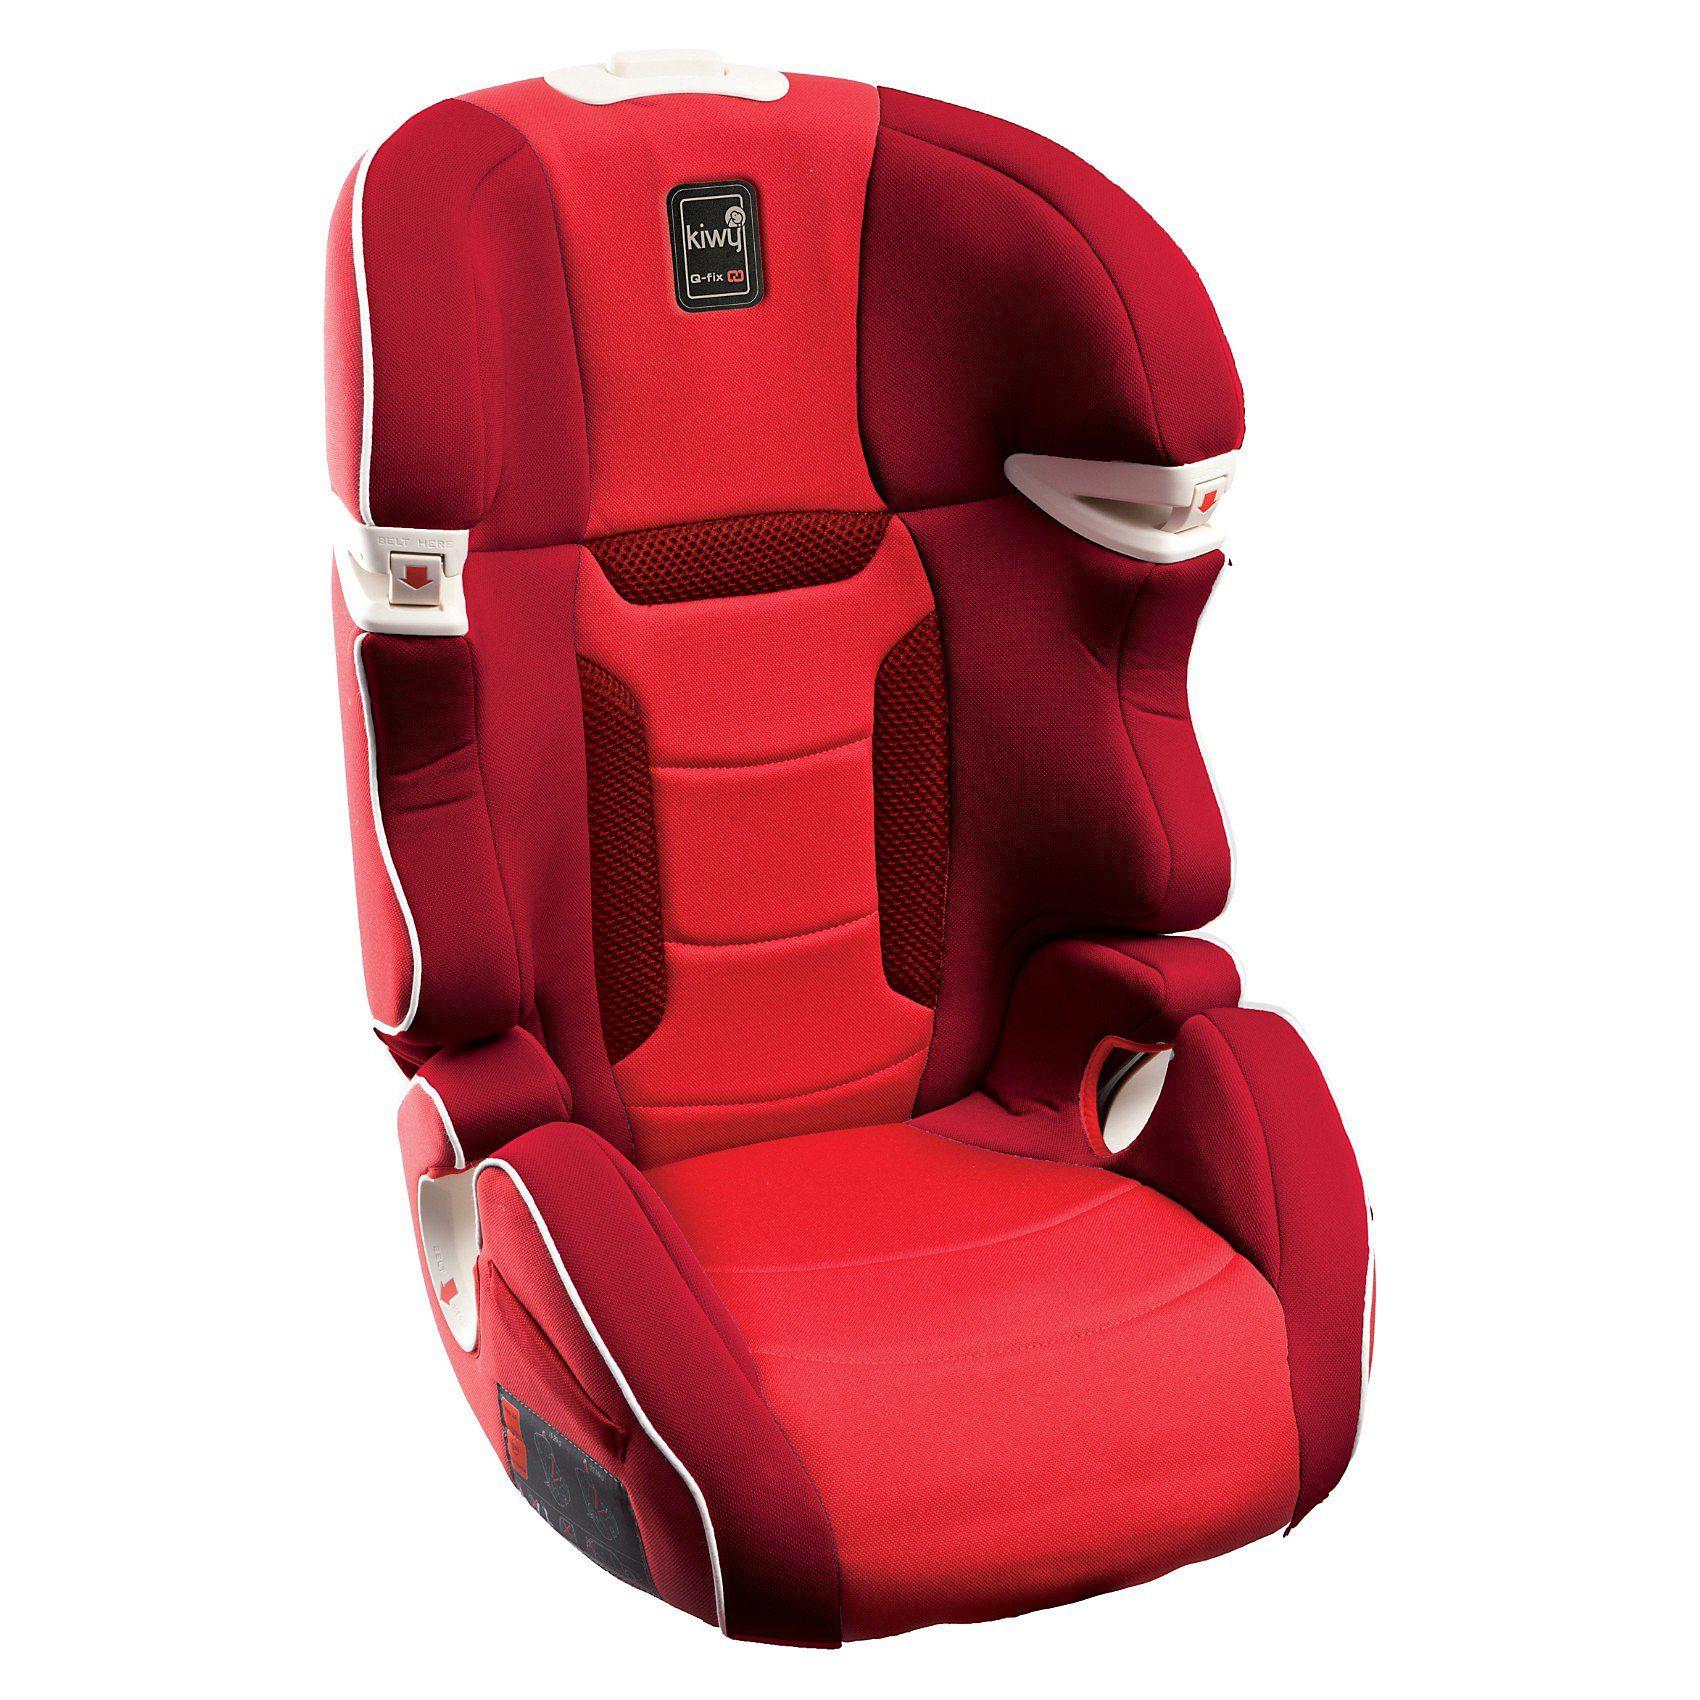 Kiwy Auto-Kindersitz SLF23 Q-Fix, Cherry, 2016